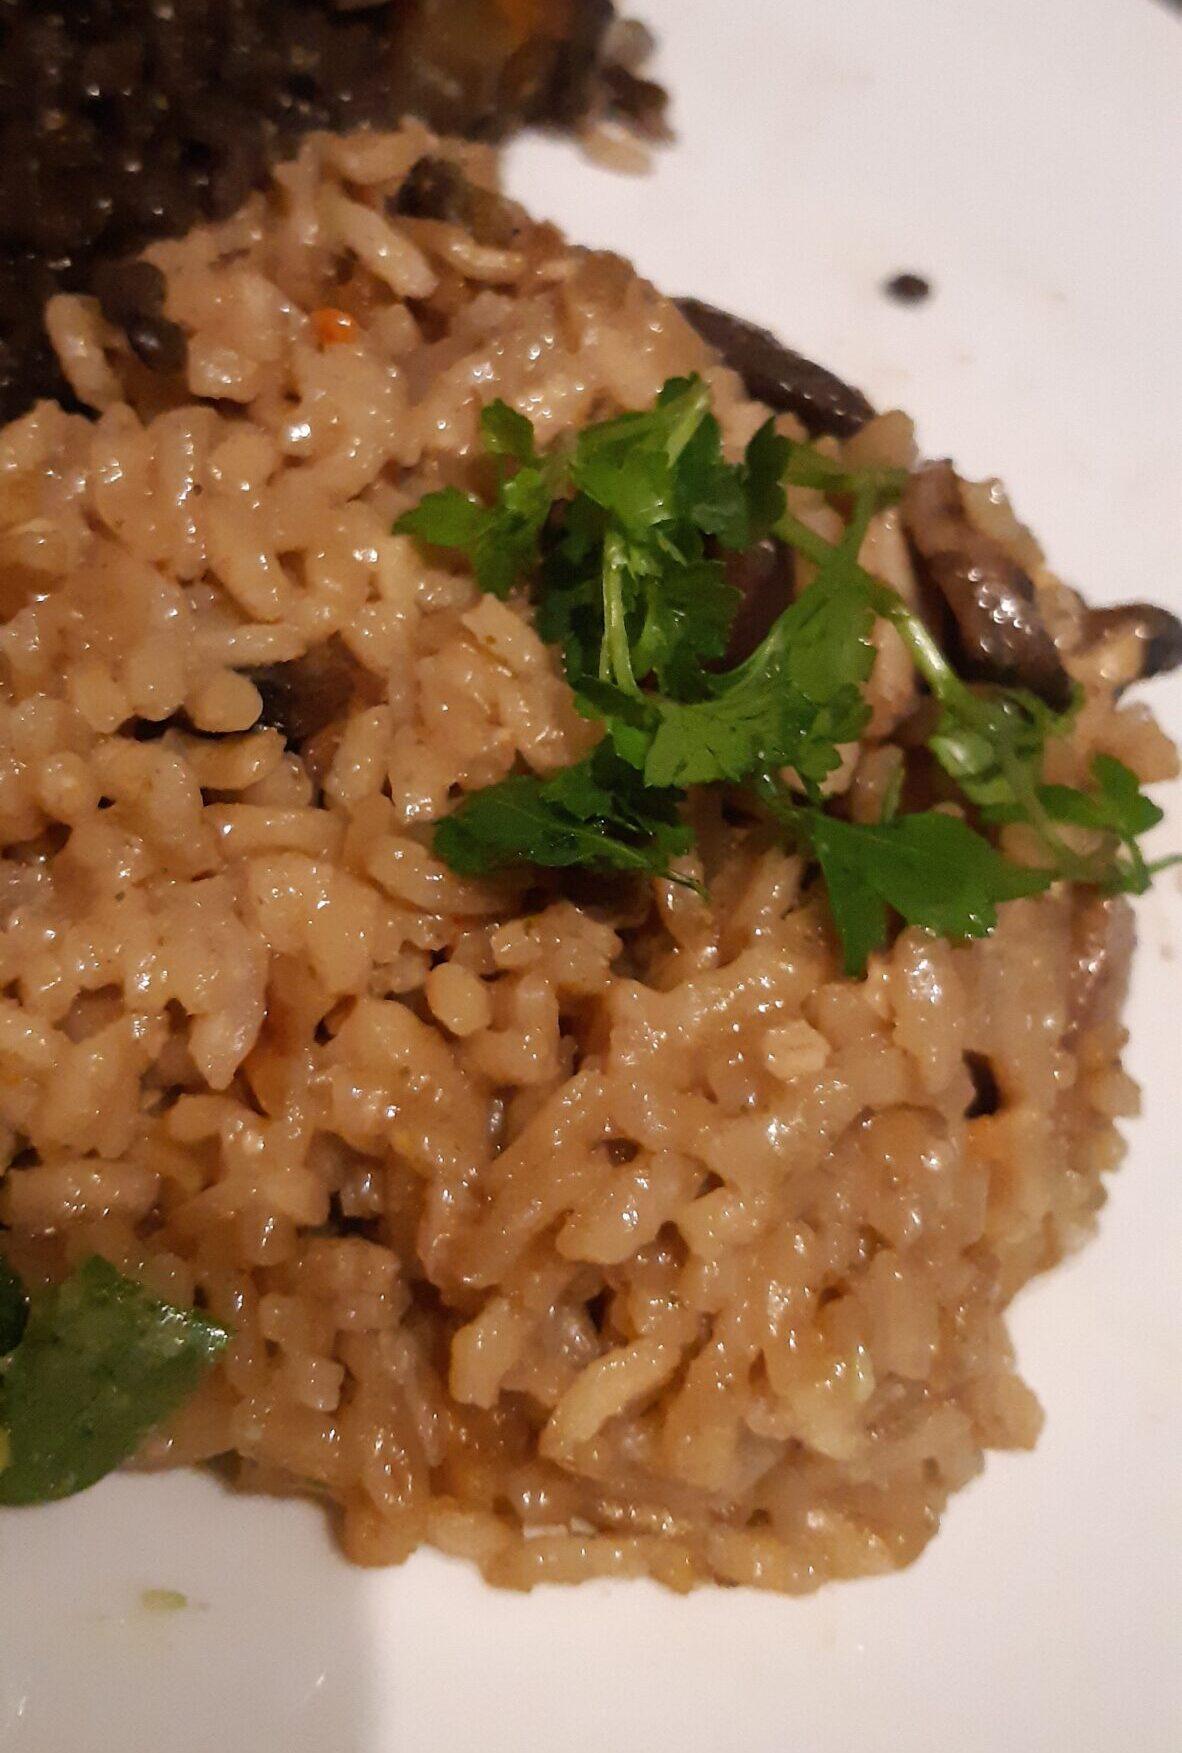 veganised creamy mushroom risotto